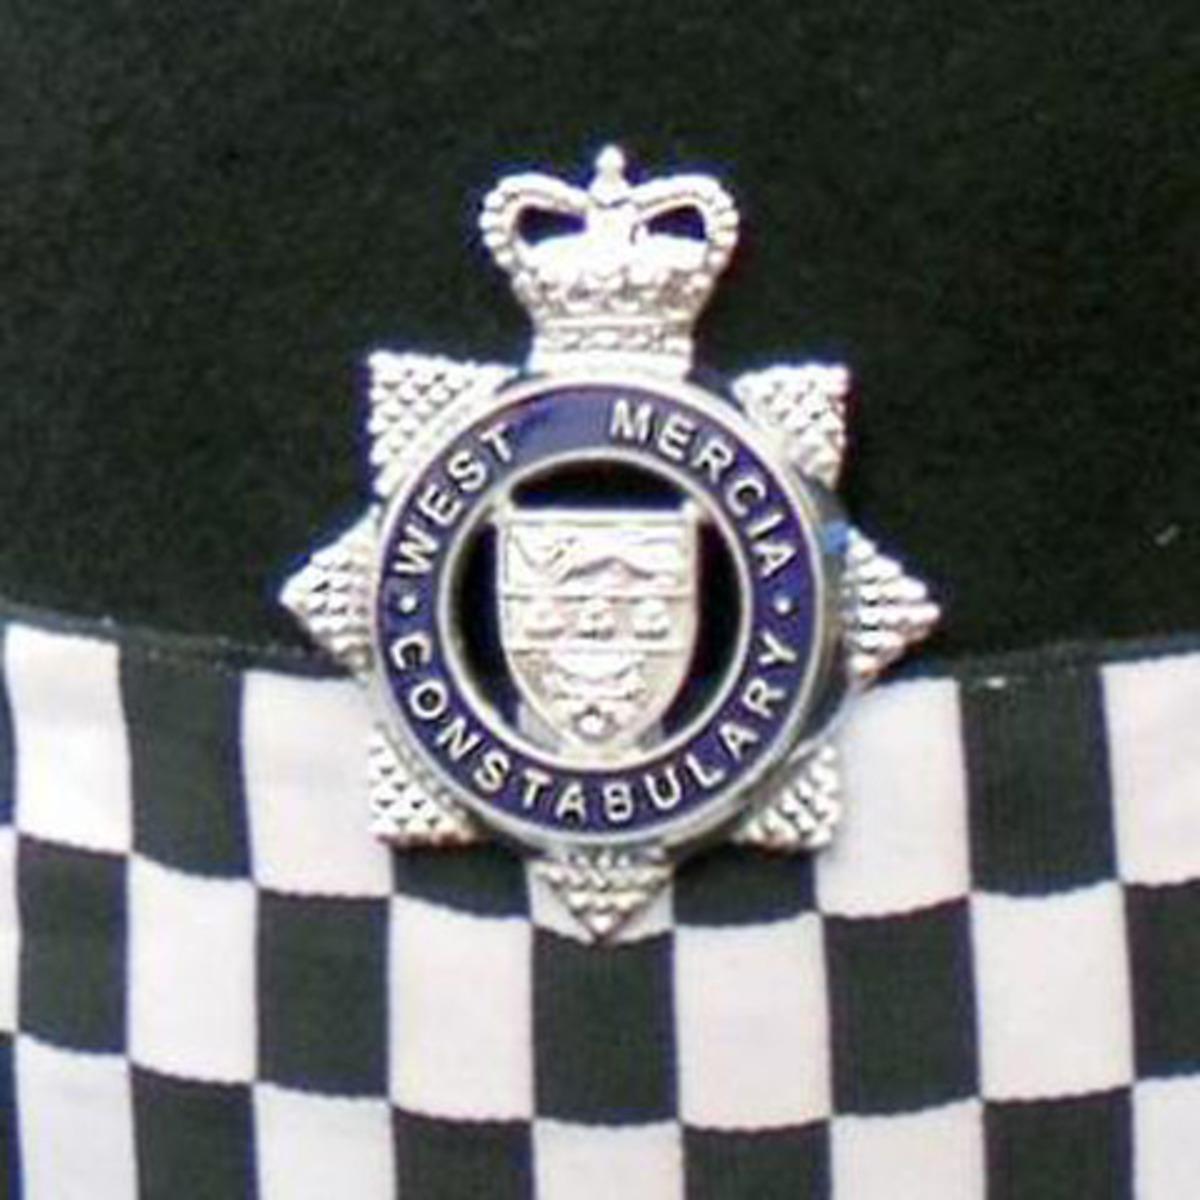 Malvern Gazette: Sex assault in Worcester: teen attacked after she leaves city nightclub